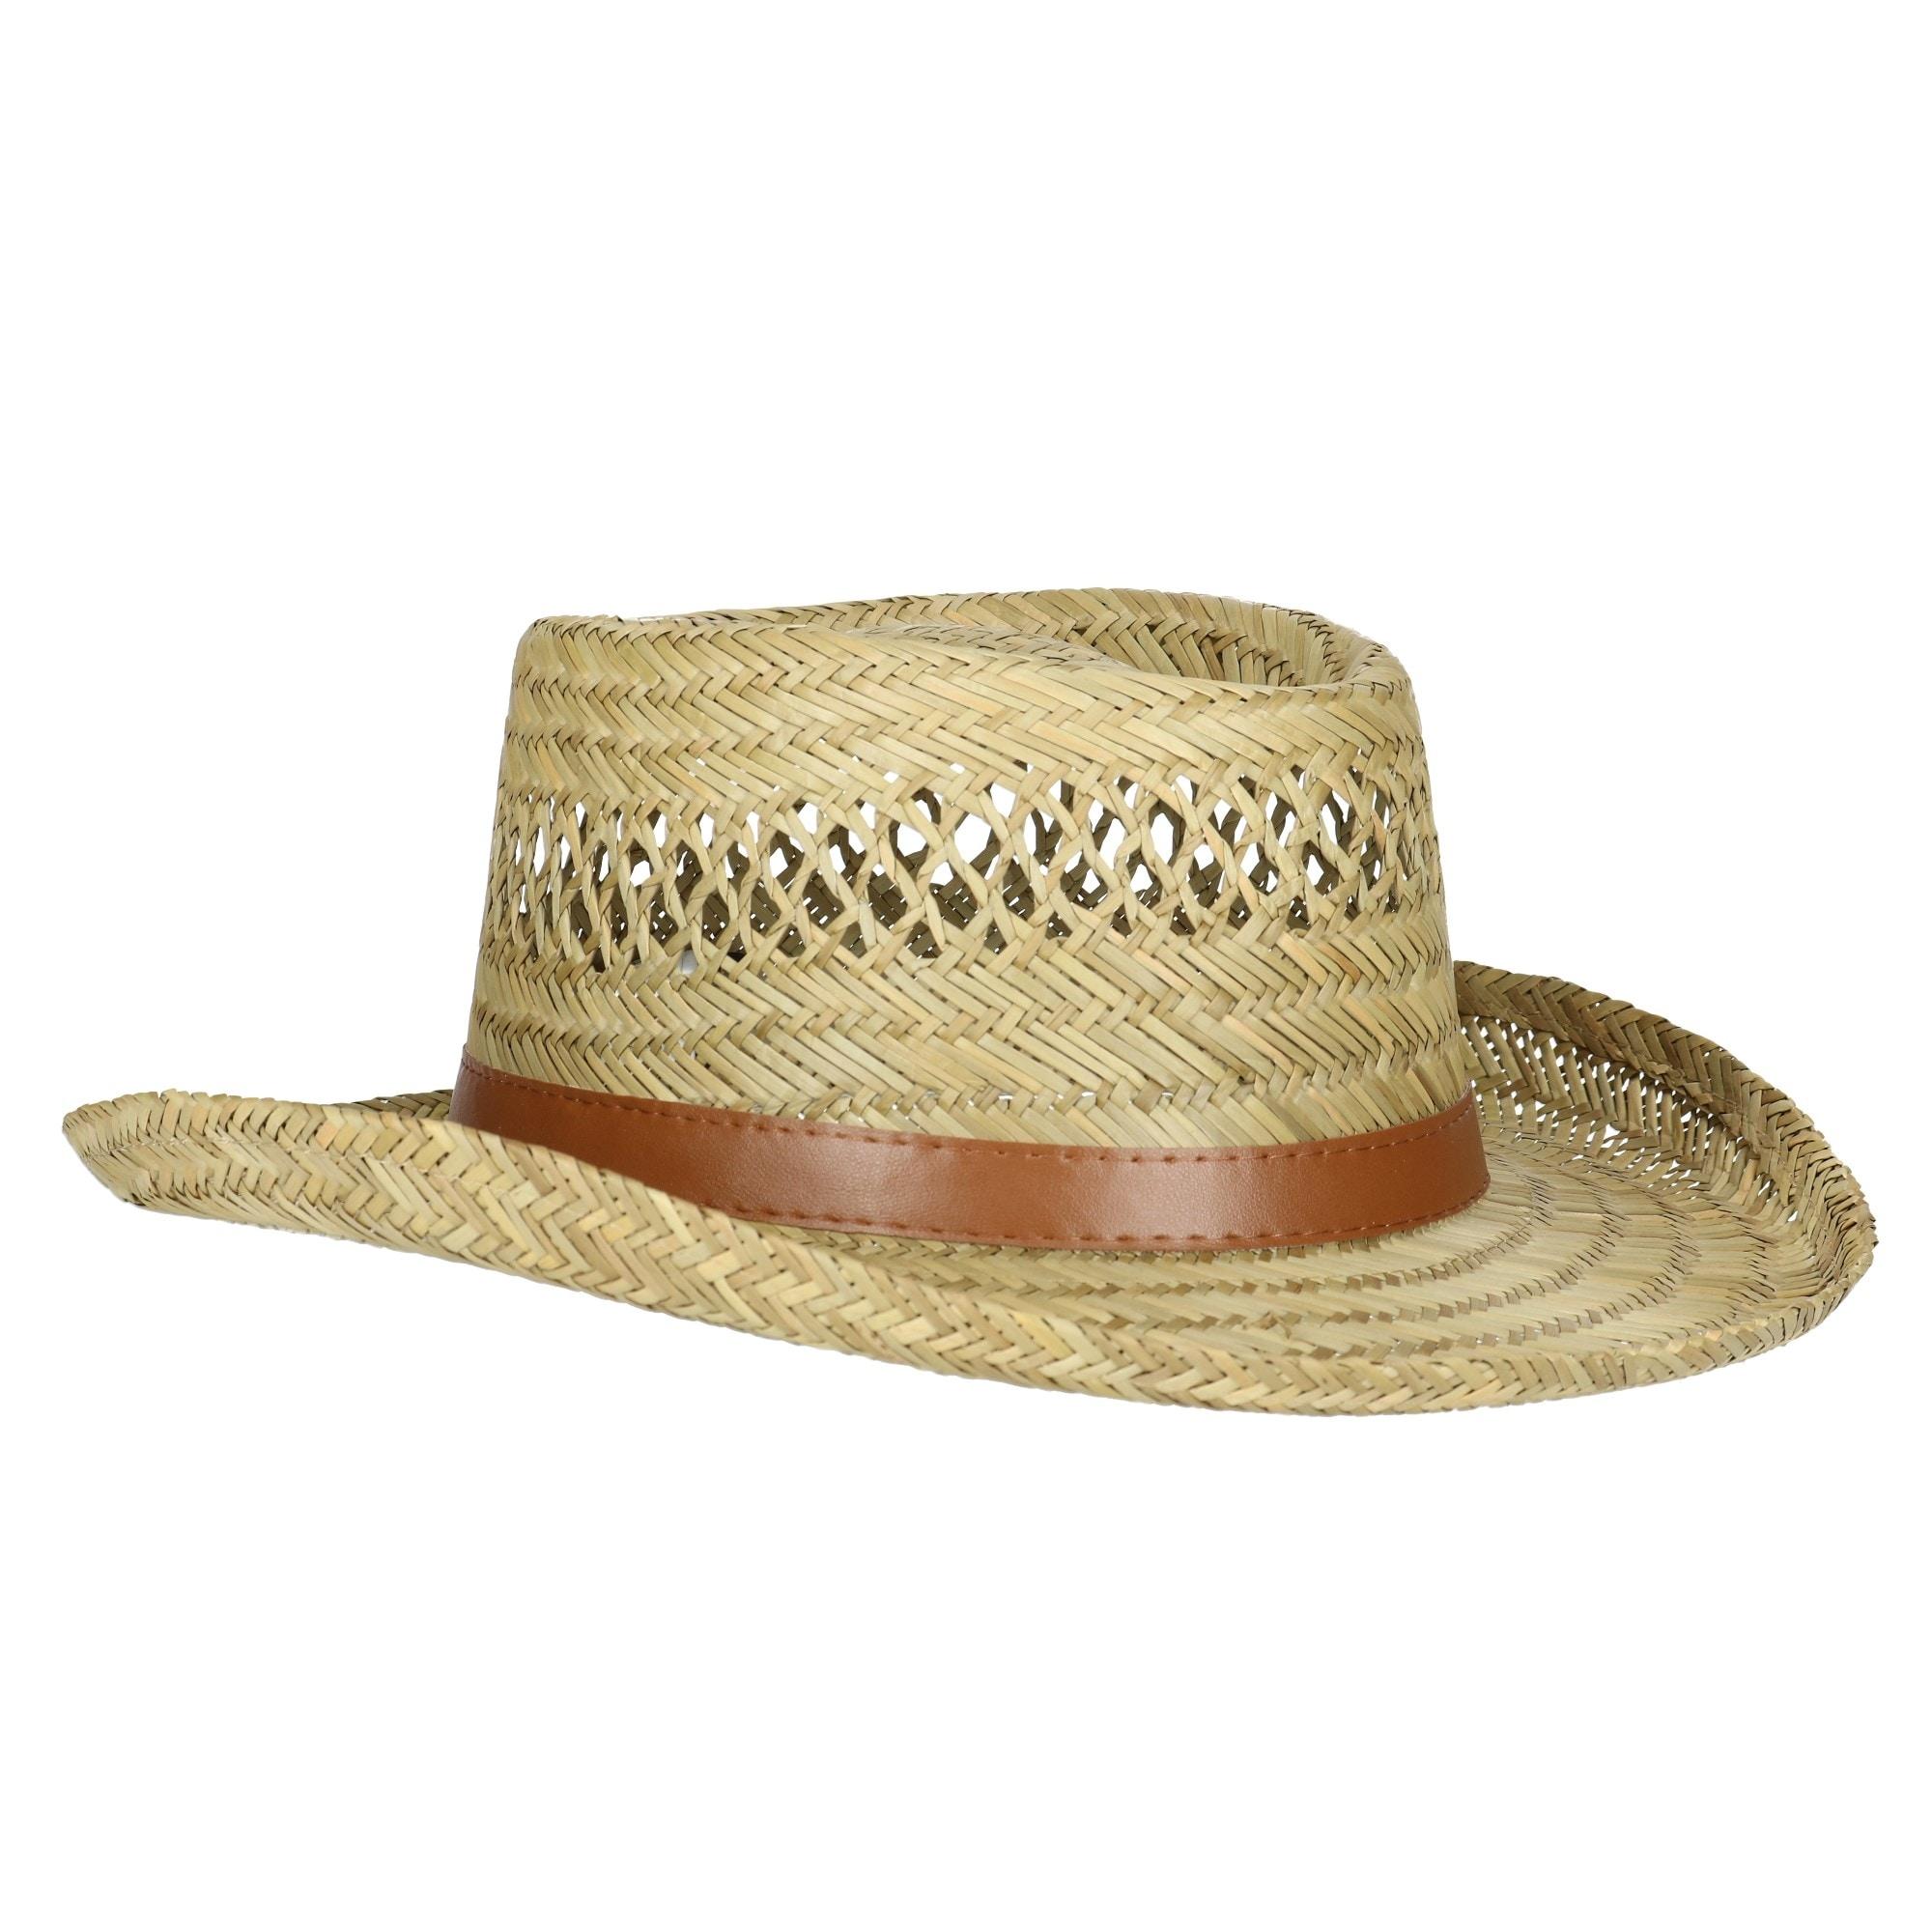 d45707a17 Dorfman Pacific Rush Straw Lightweight Gambler Hat with Wide Brim